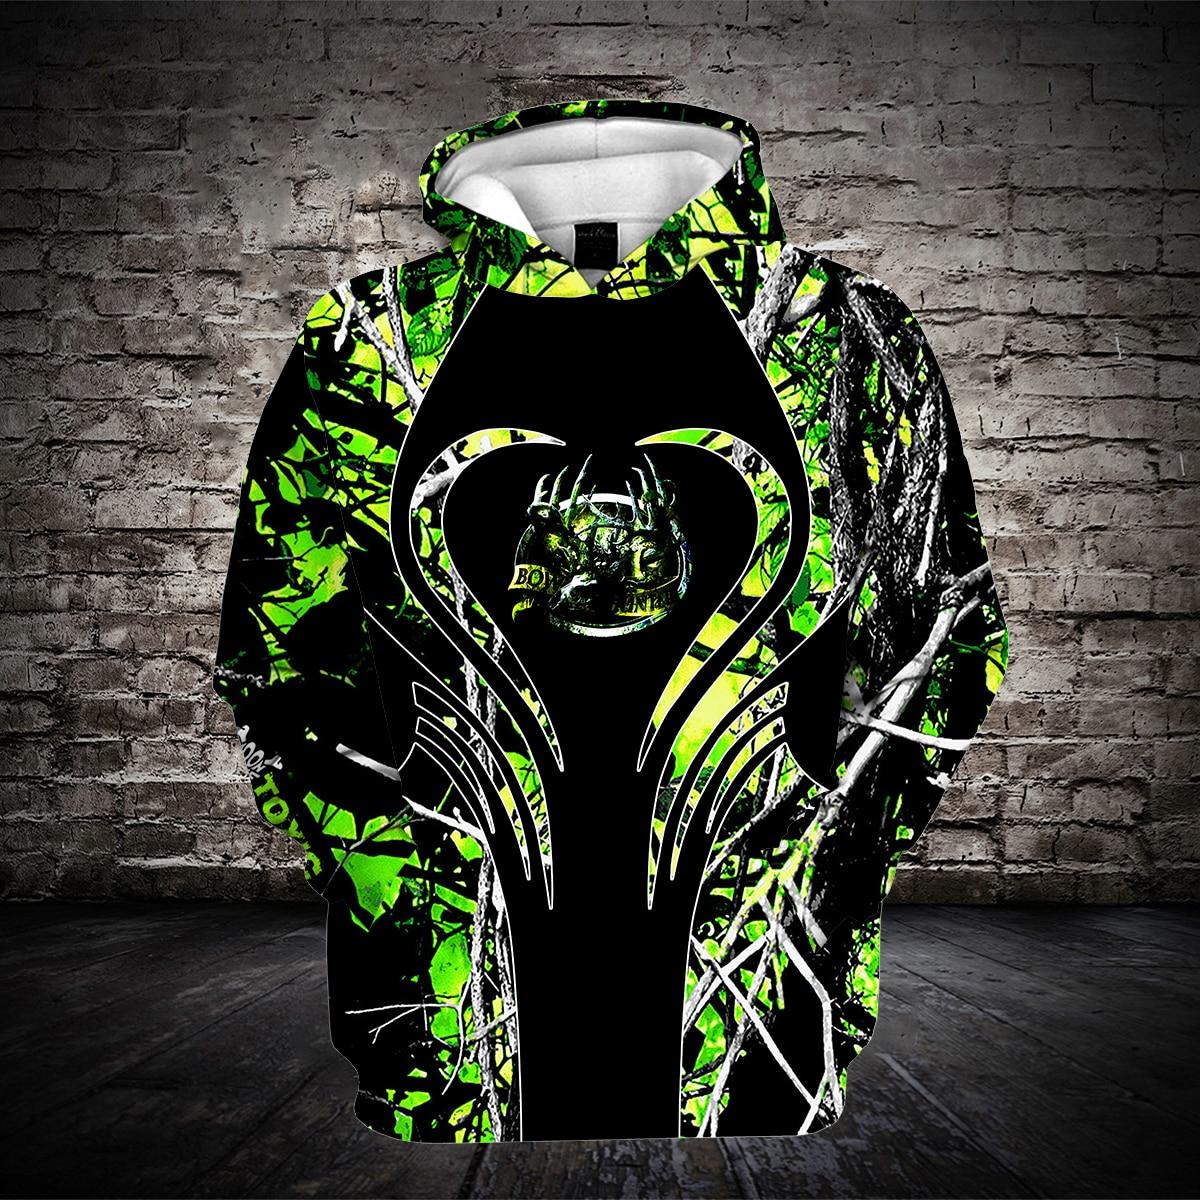 2020 Fashion Outdoors Bow Hunting Hoodies Jungle Deer 3D Printed Hoodie Green Casual Tops Men/Women Clothing Drop Shipping